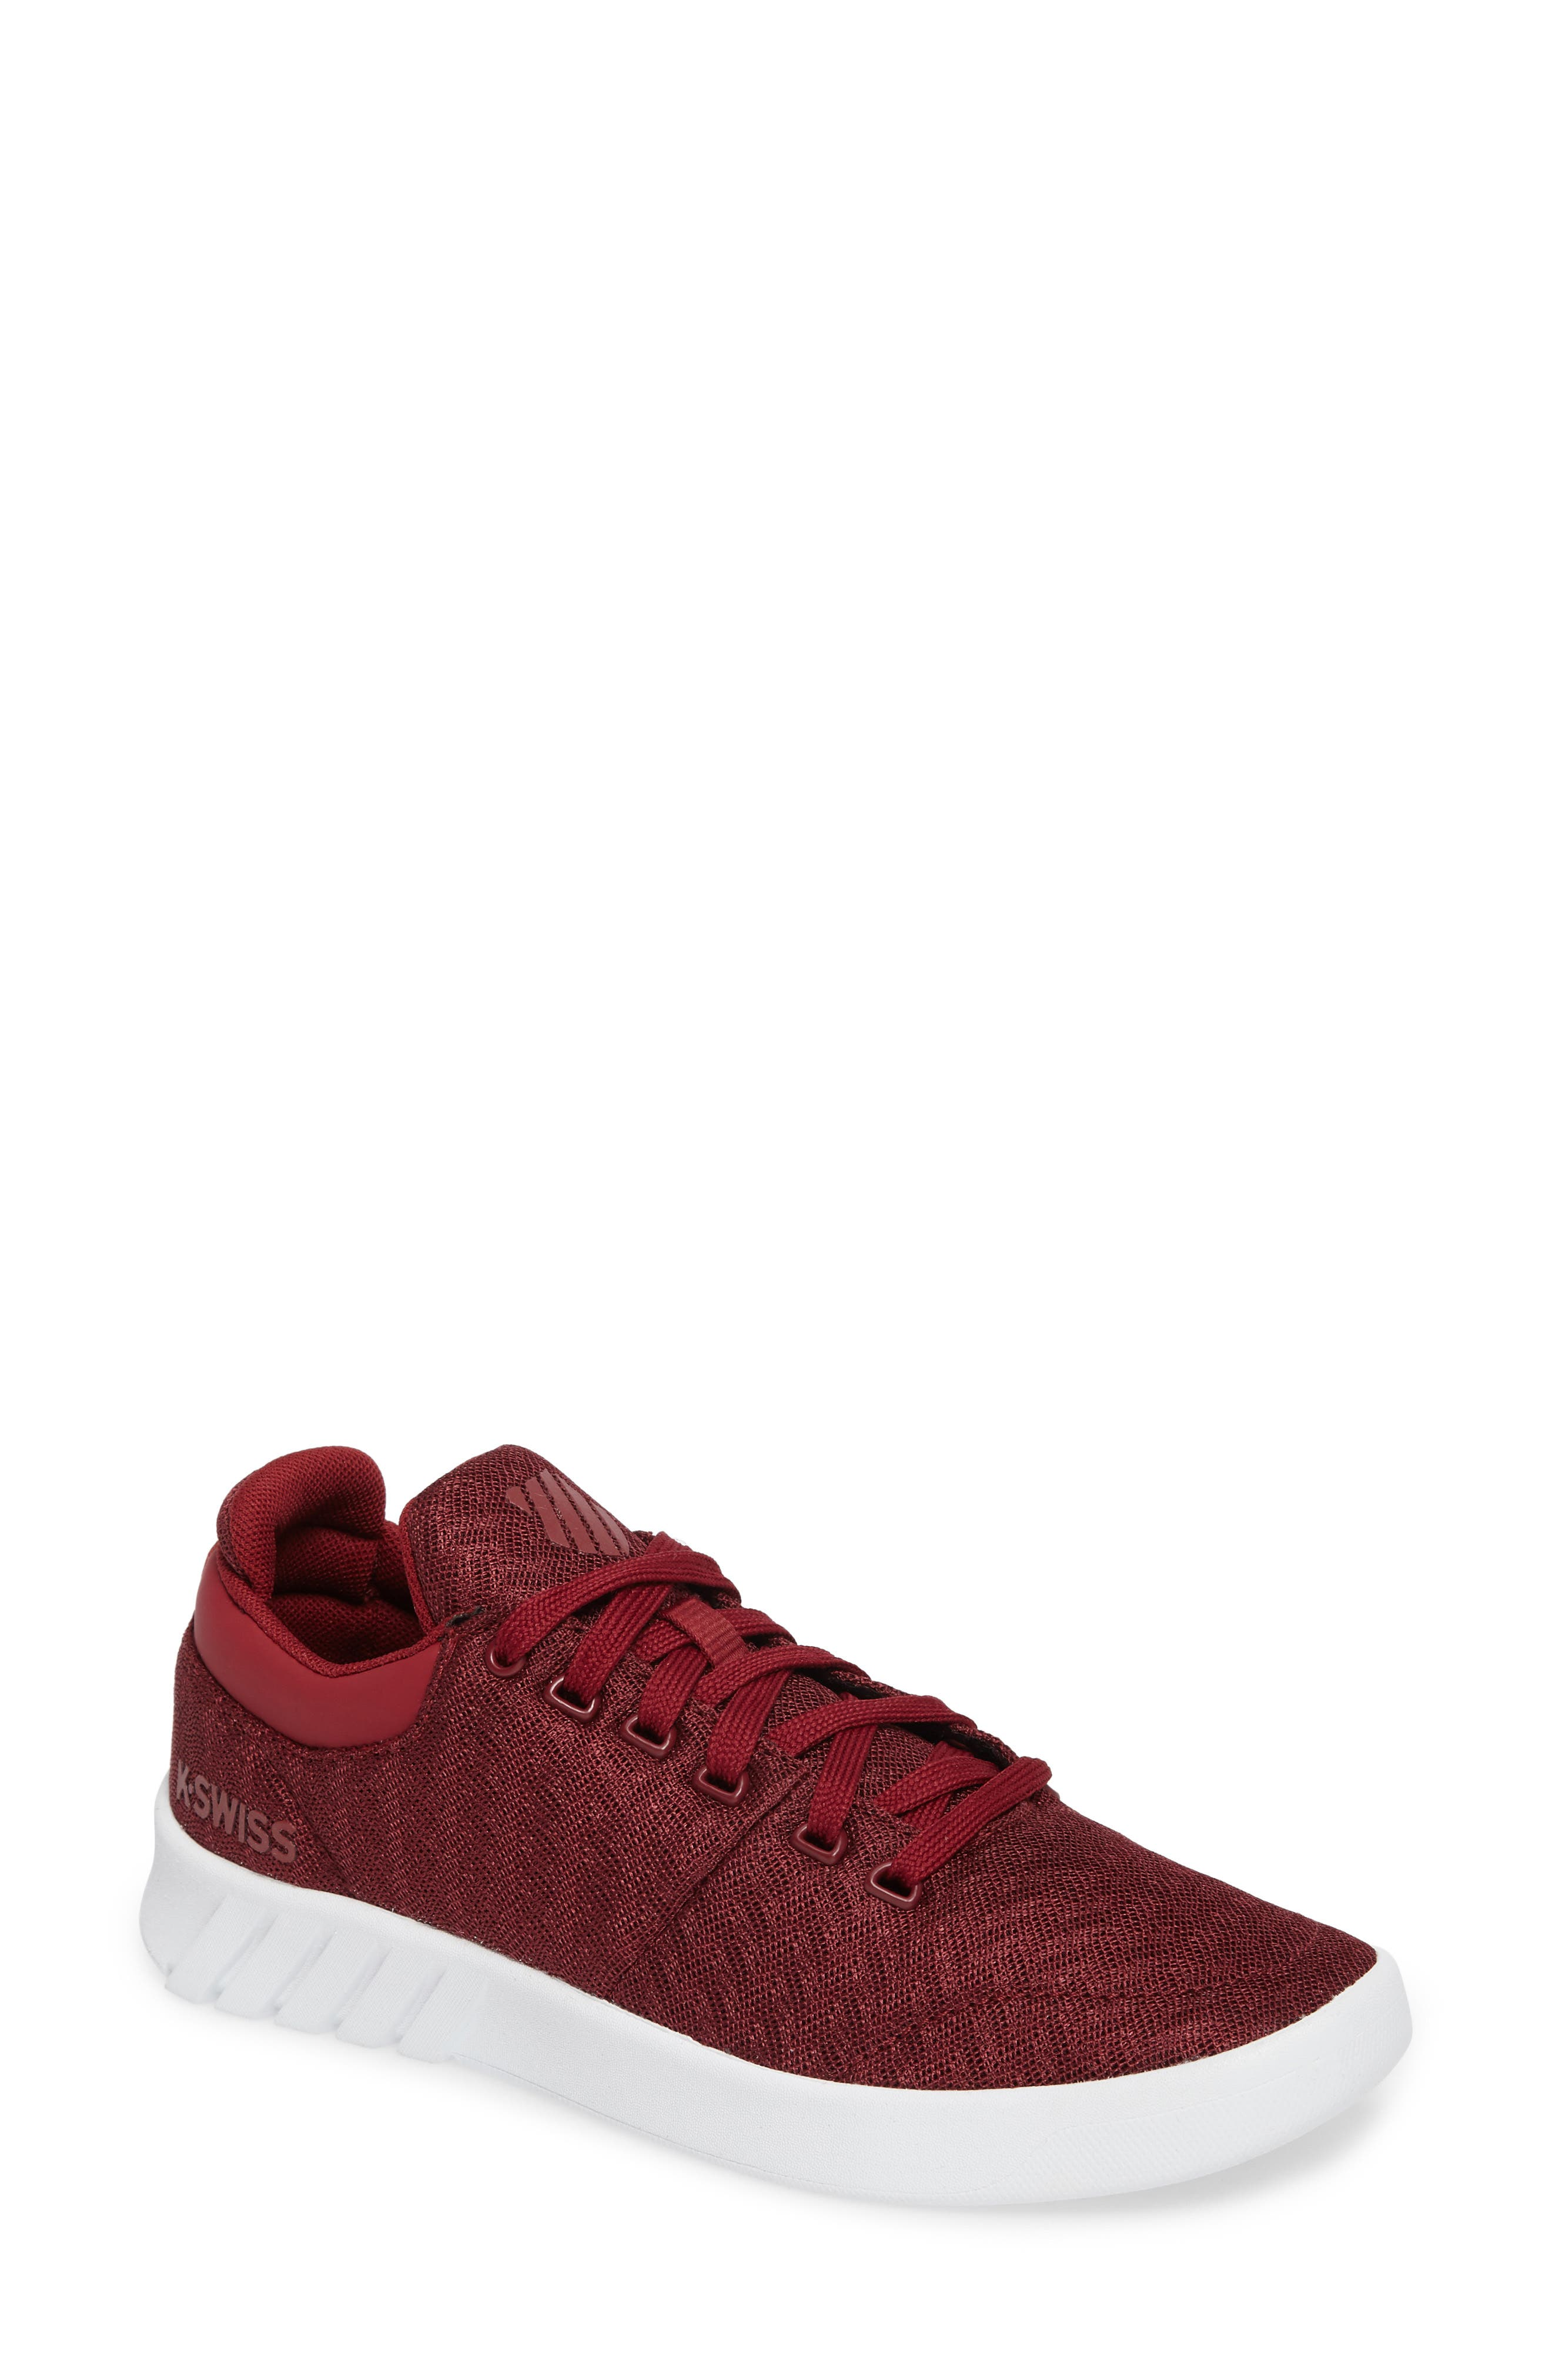 Aero Trainer T Sneaker,                             Main thumbnail 1, color,                             Tibetan Red/ White